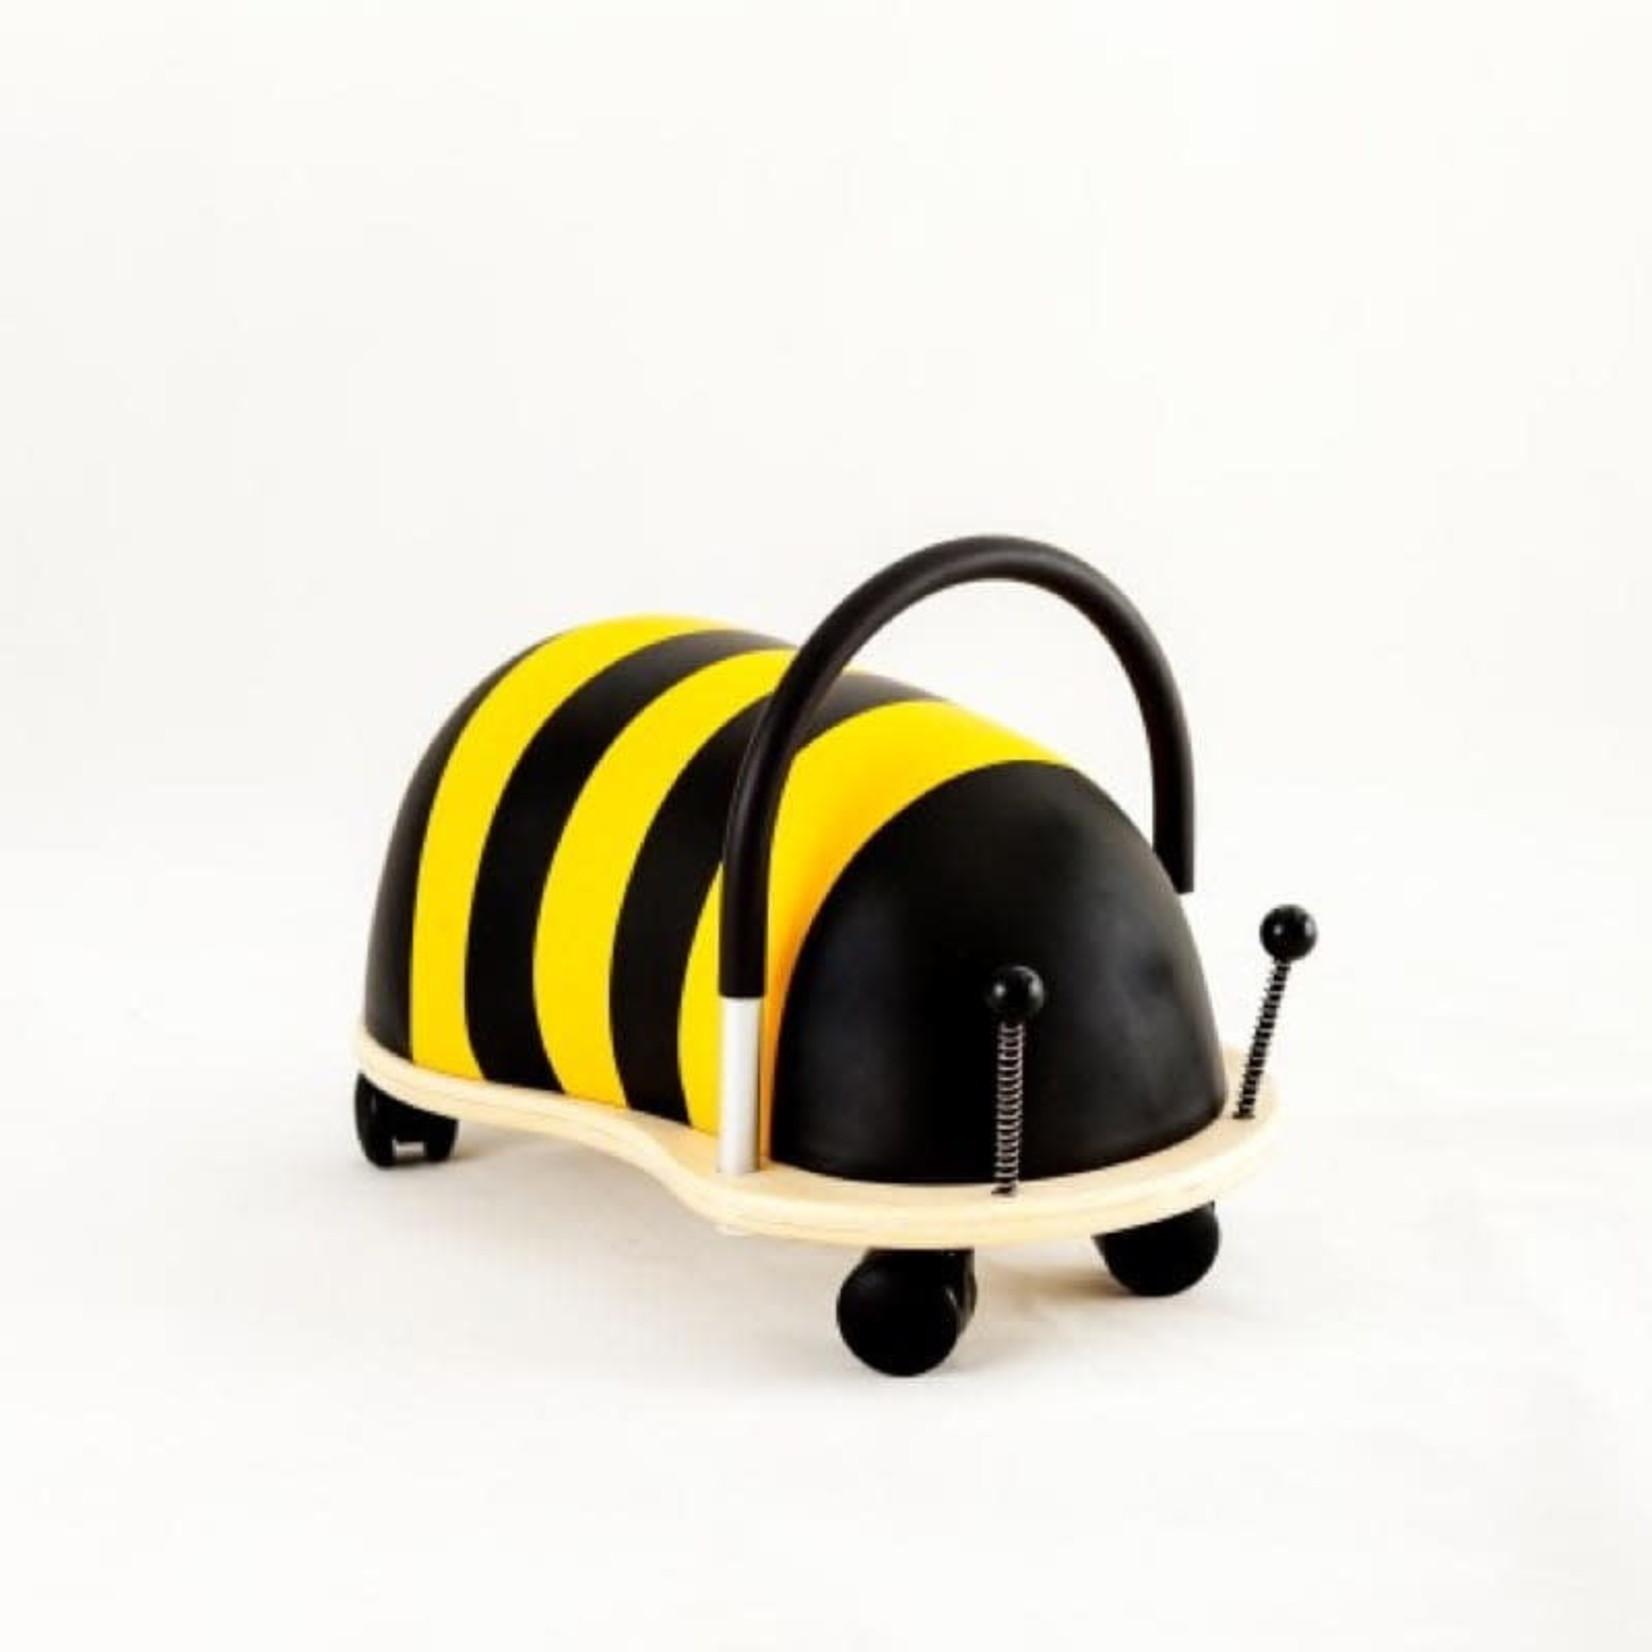 WHEELY BUG Wheely Bug Small